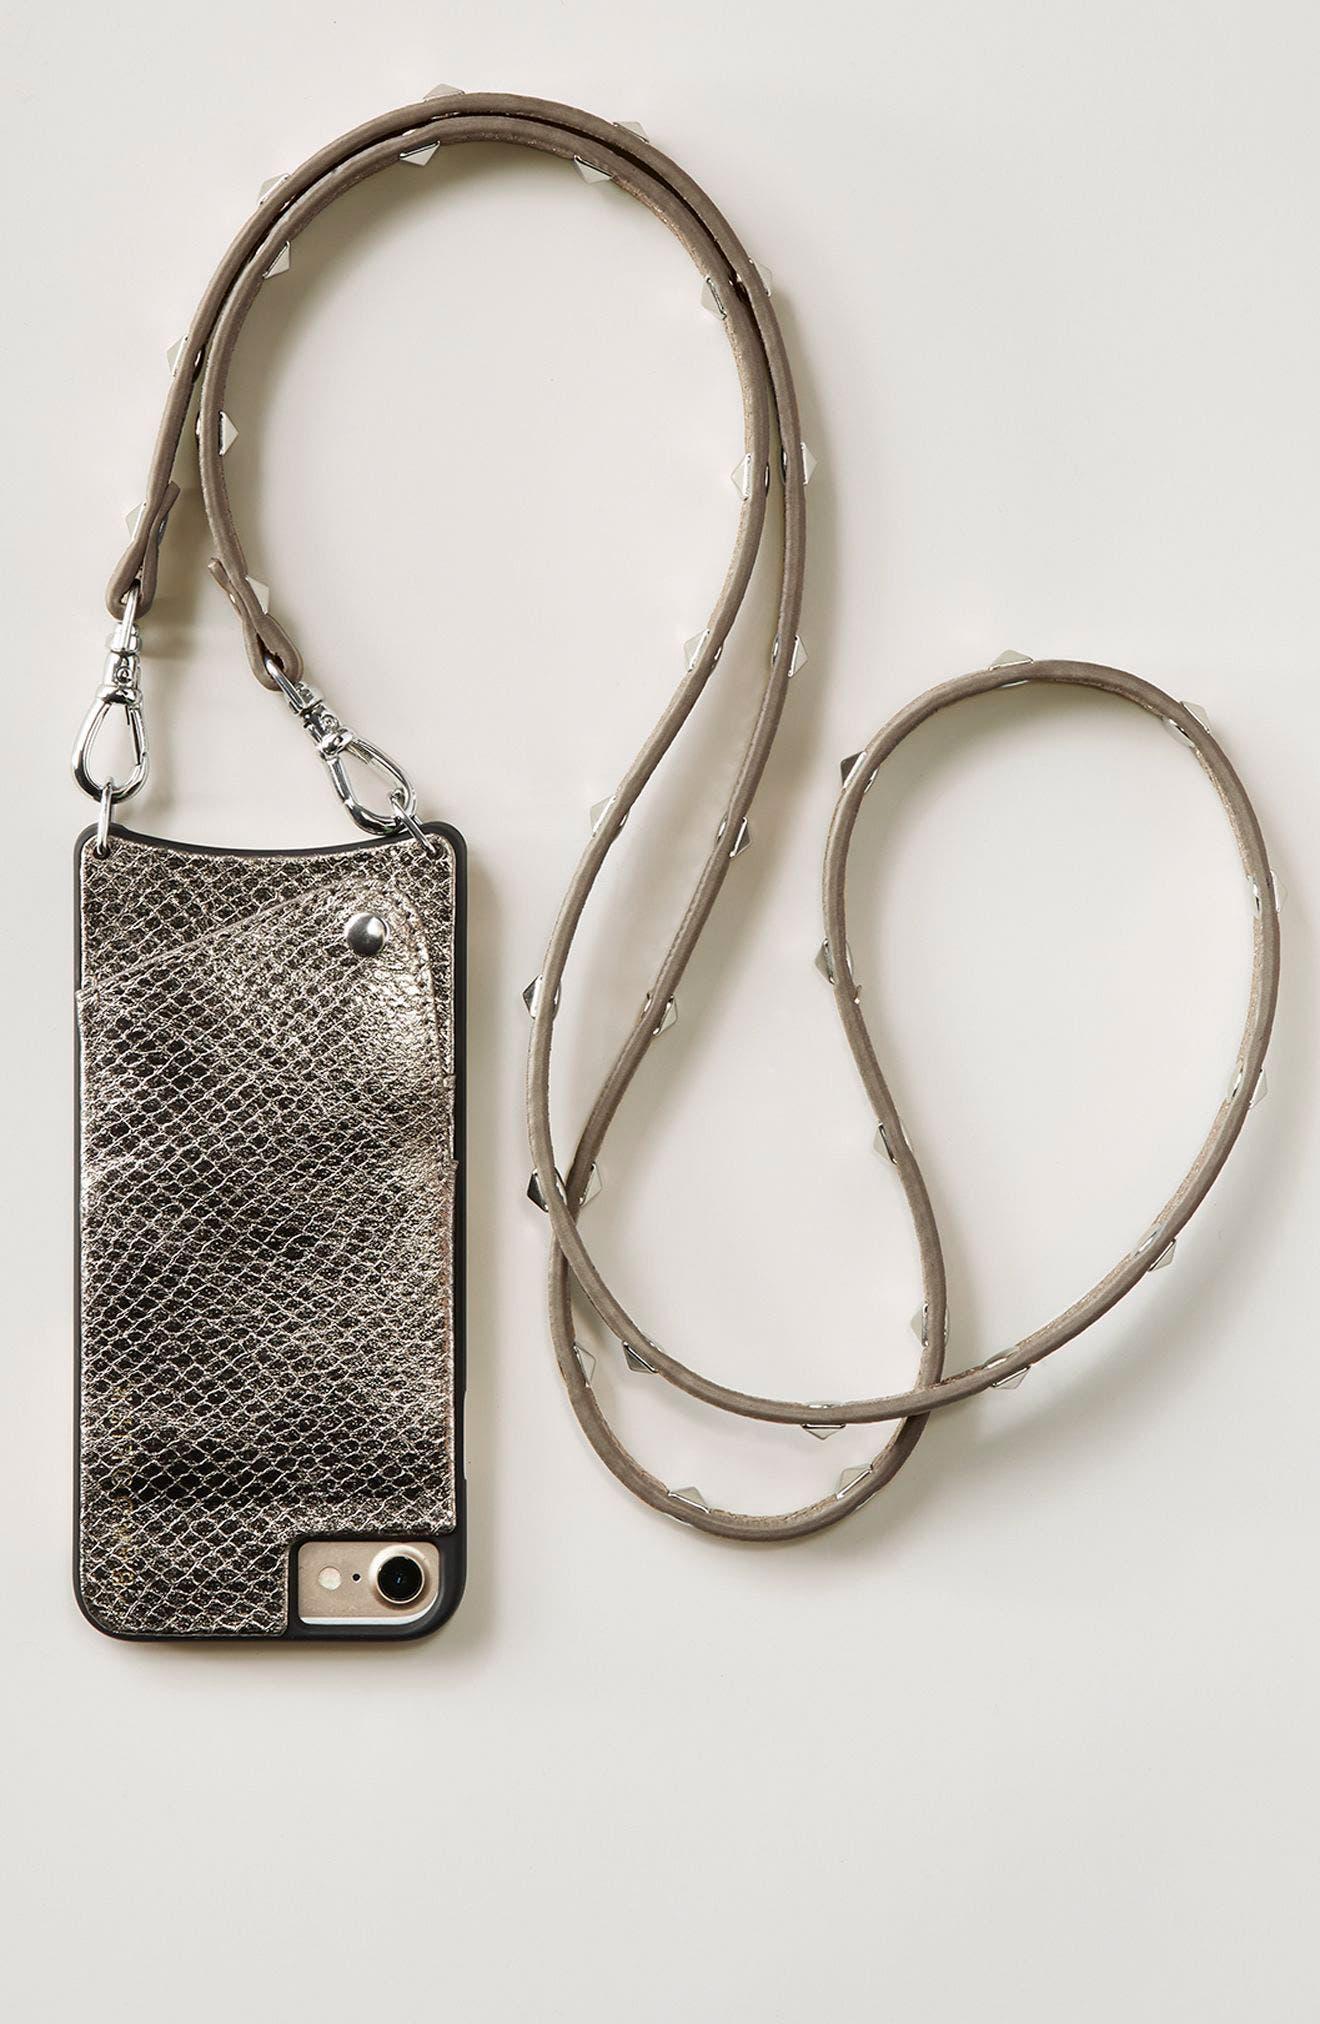 Sarah Metallic Faux Snakeskin iPhone 6/7/8 & 6/7/8 Plus Crossbody Case,                             Alternate thumbnail 7, color,                             040